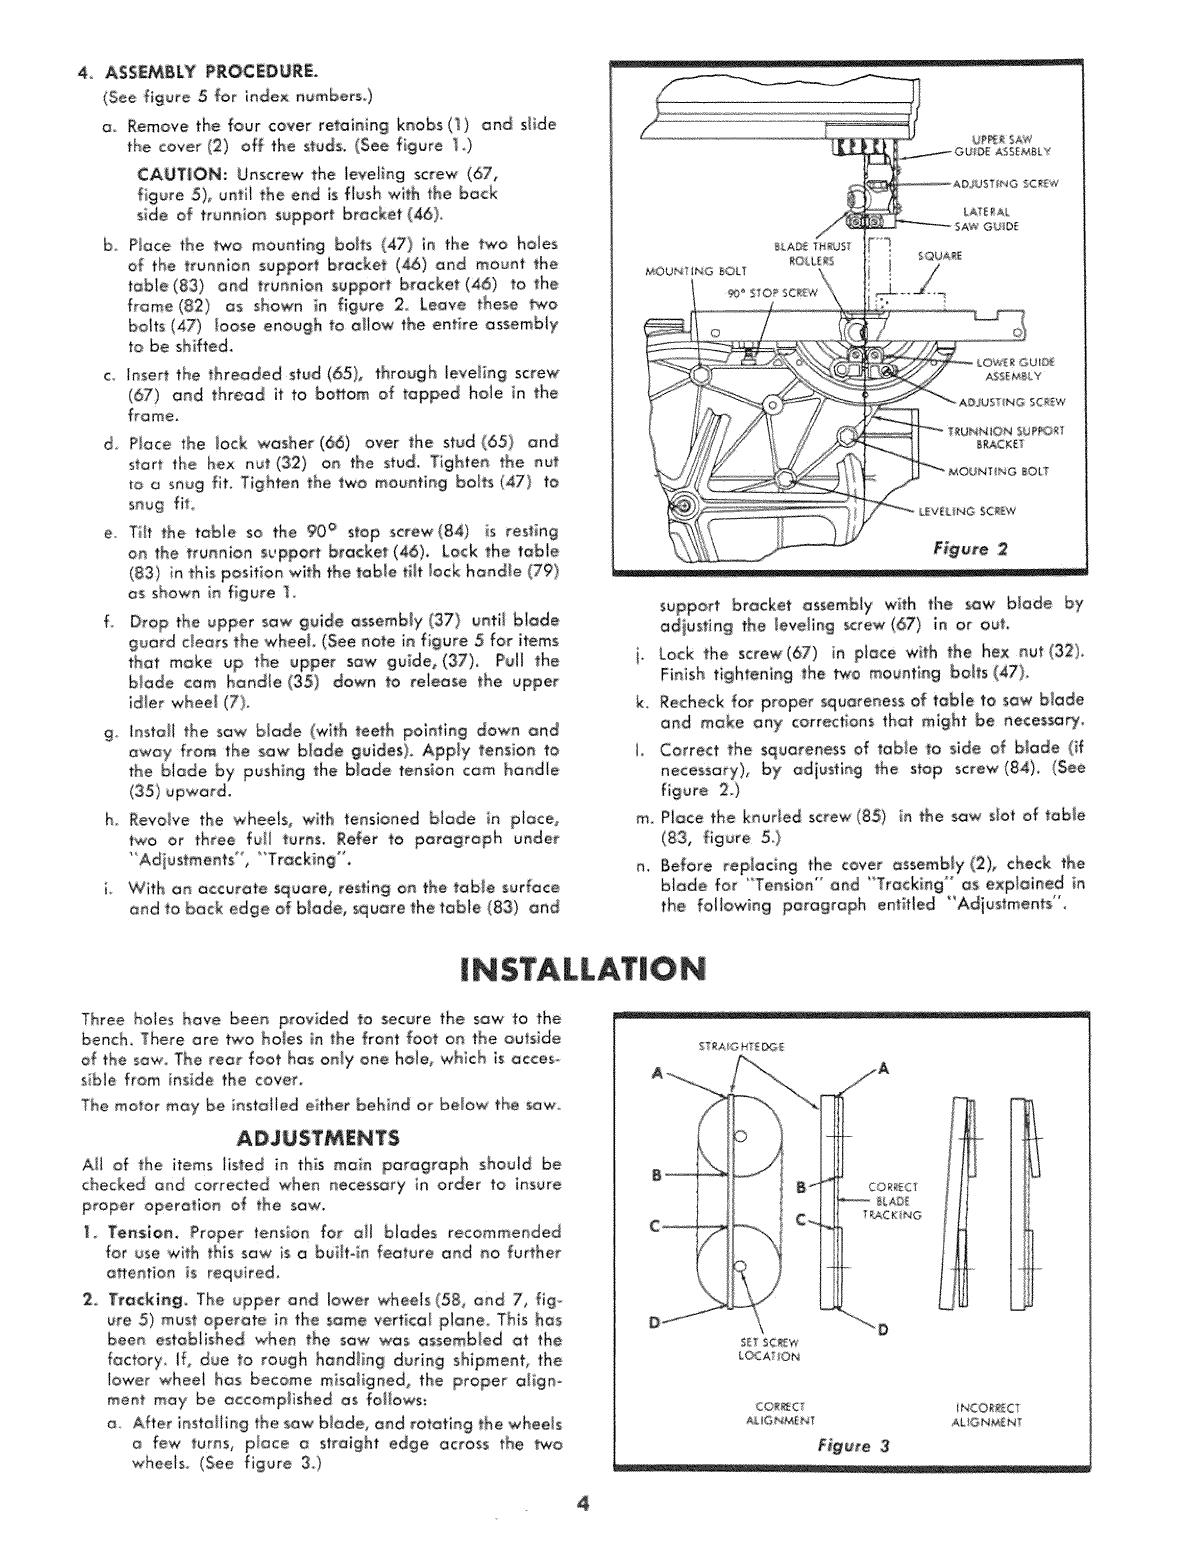 Craftsman 113242610 User Manual 12 INCH BAND SAW Manuals